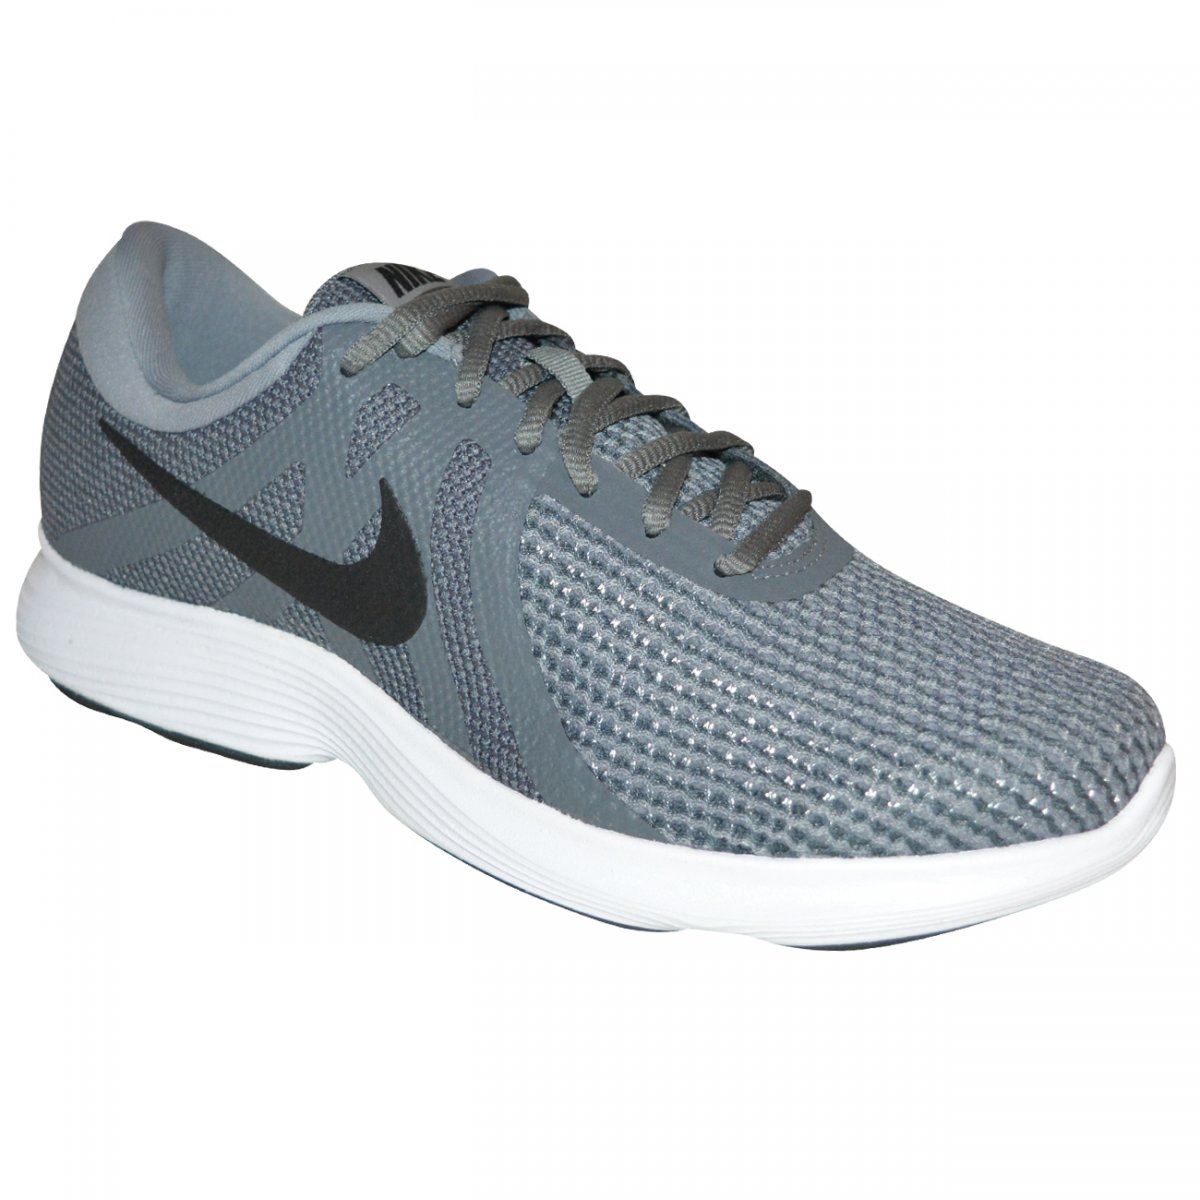 Tenis Nike Revolution 4 908988 010 - Grafite branco preto - Chuteira Nike 9588dc38db3bf